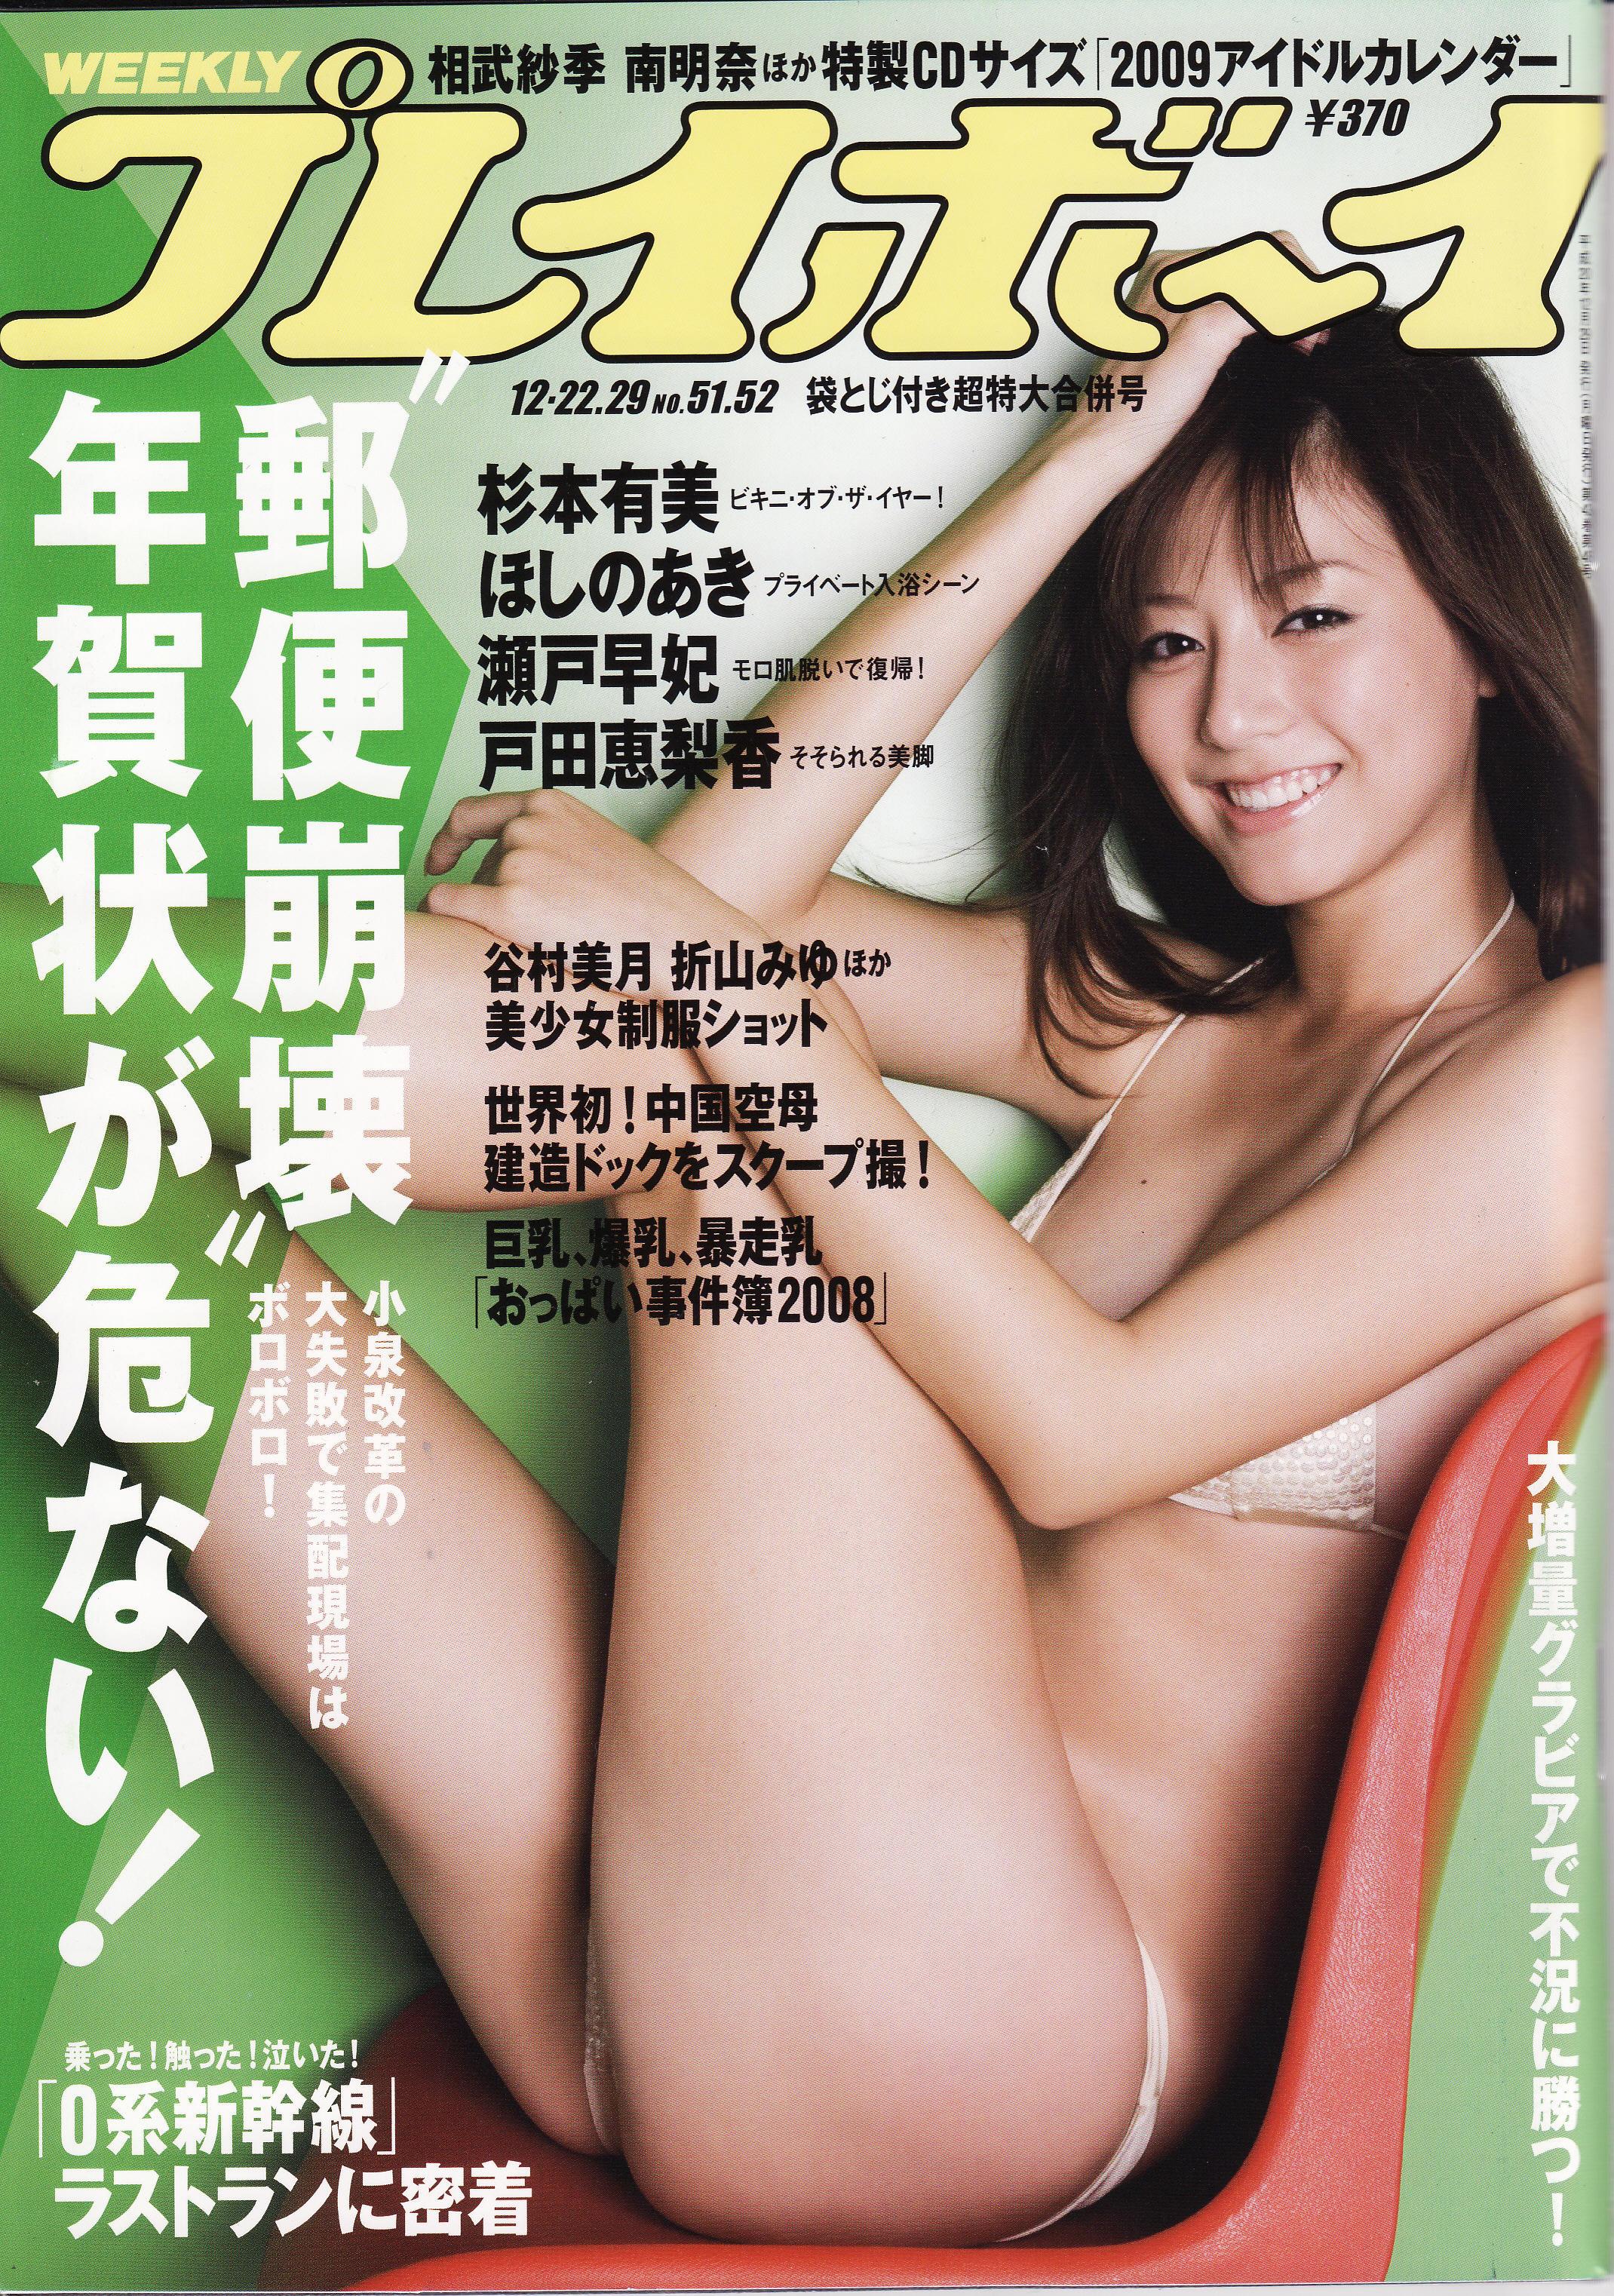 Mangas - Playboy